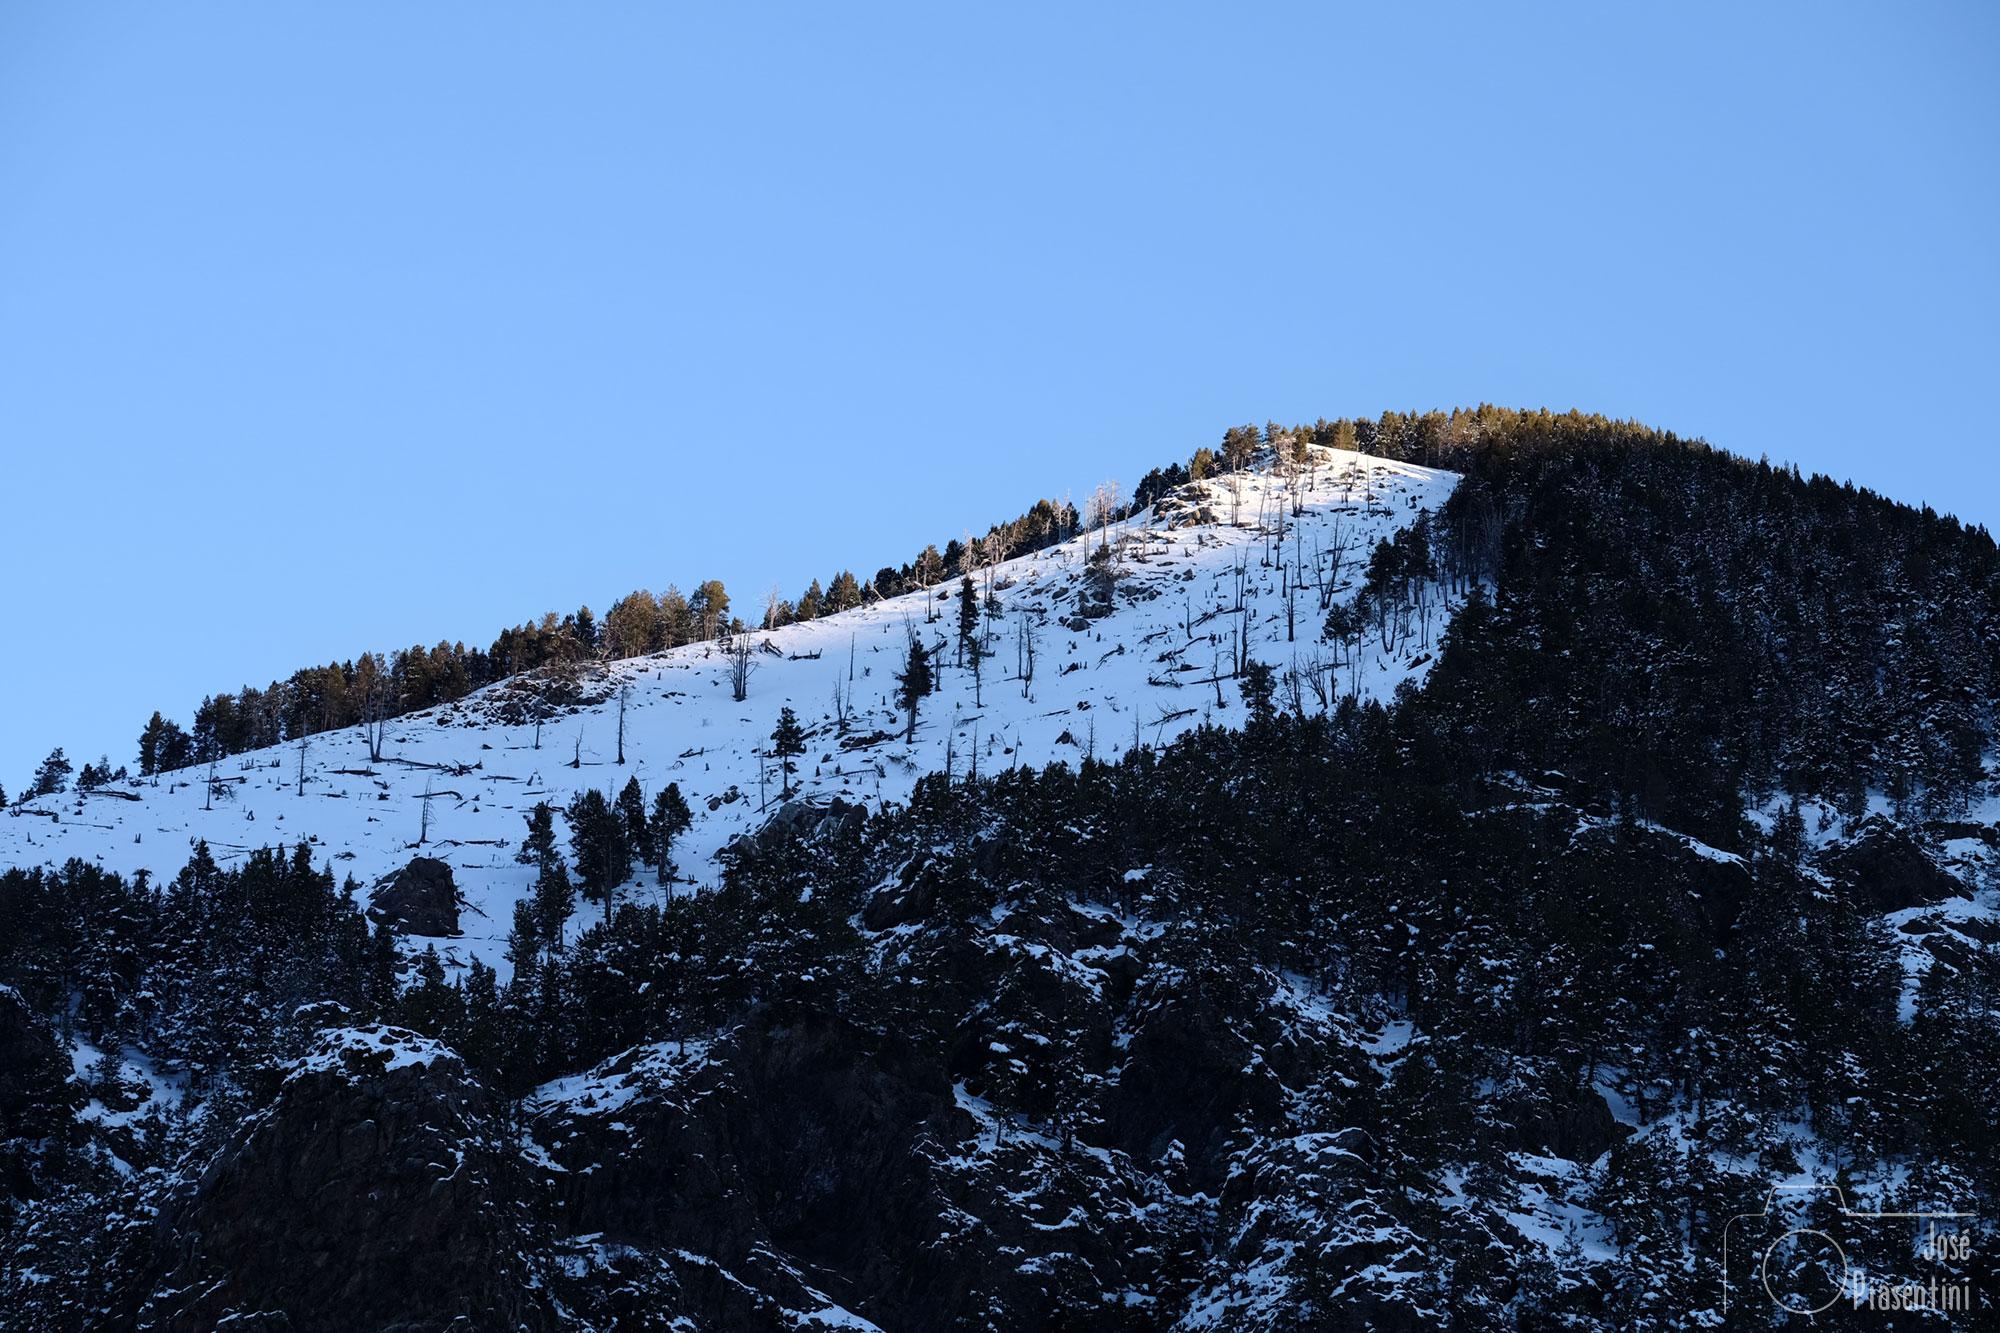 Andorralovers